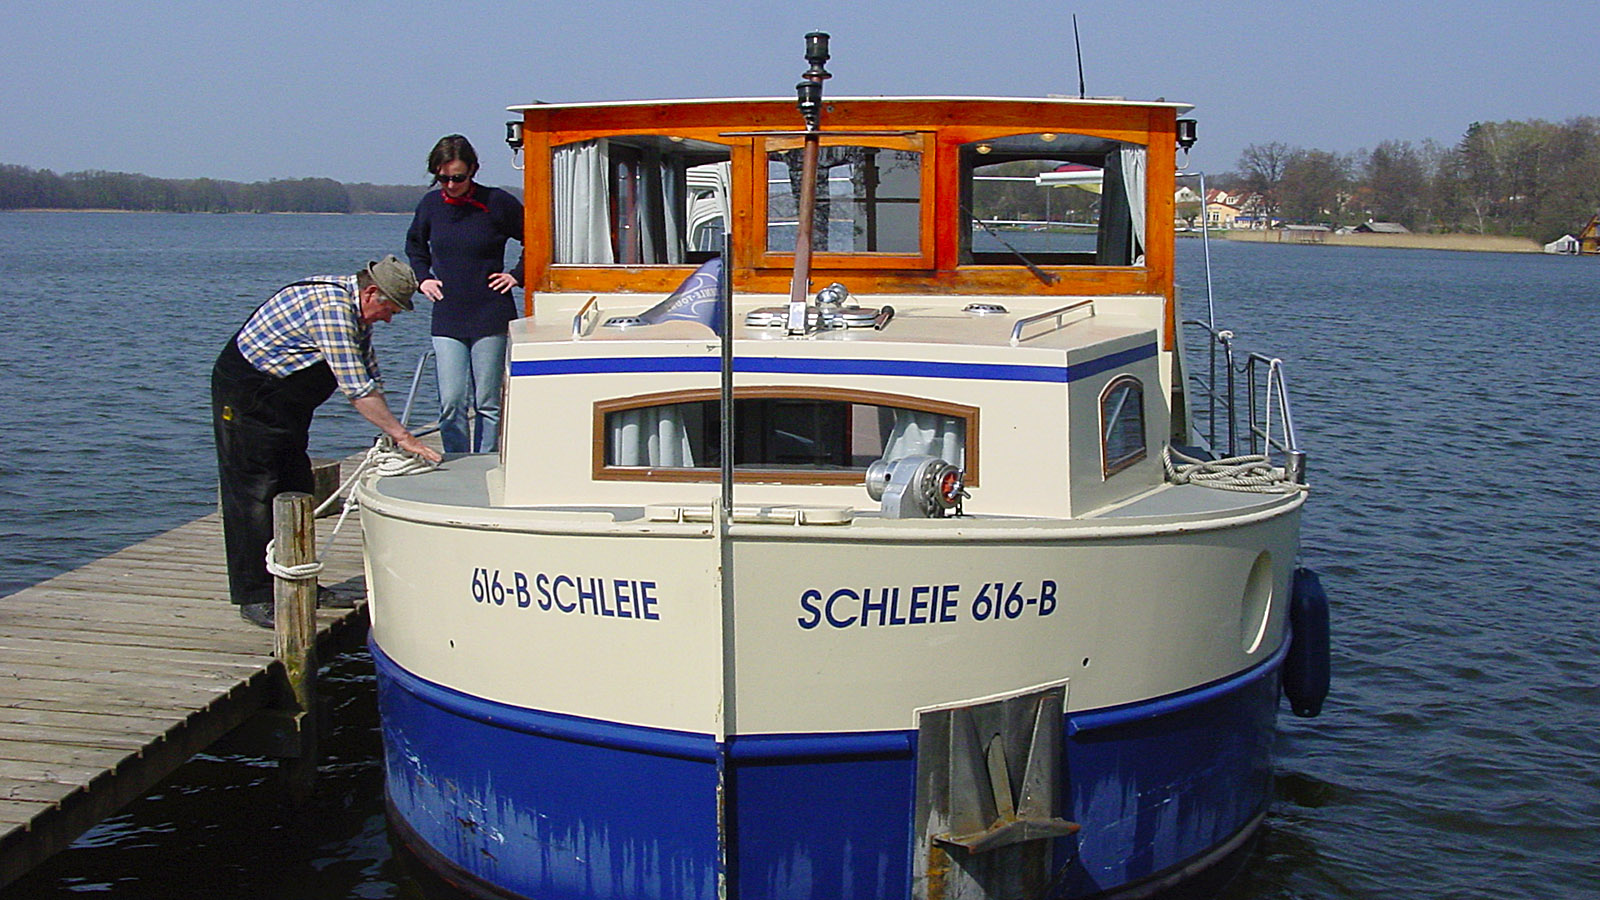 Hausboot-Törn in Mecklenburg. Horst Rick vertäut das 11-Meter-Hausboot am Bootssteg vor der Schlossinsel; Gesche Harm schaut zu. Foto: Hilke Maunder